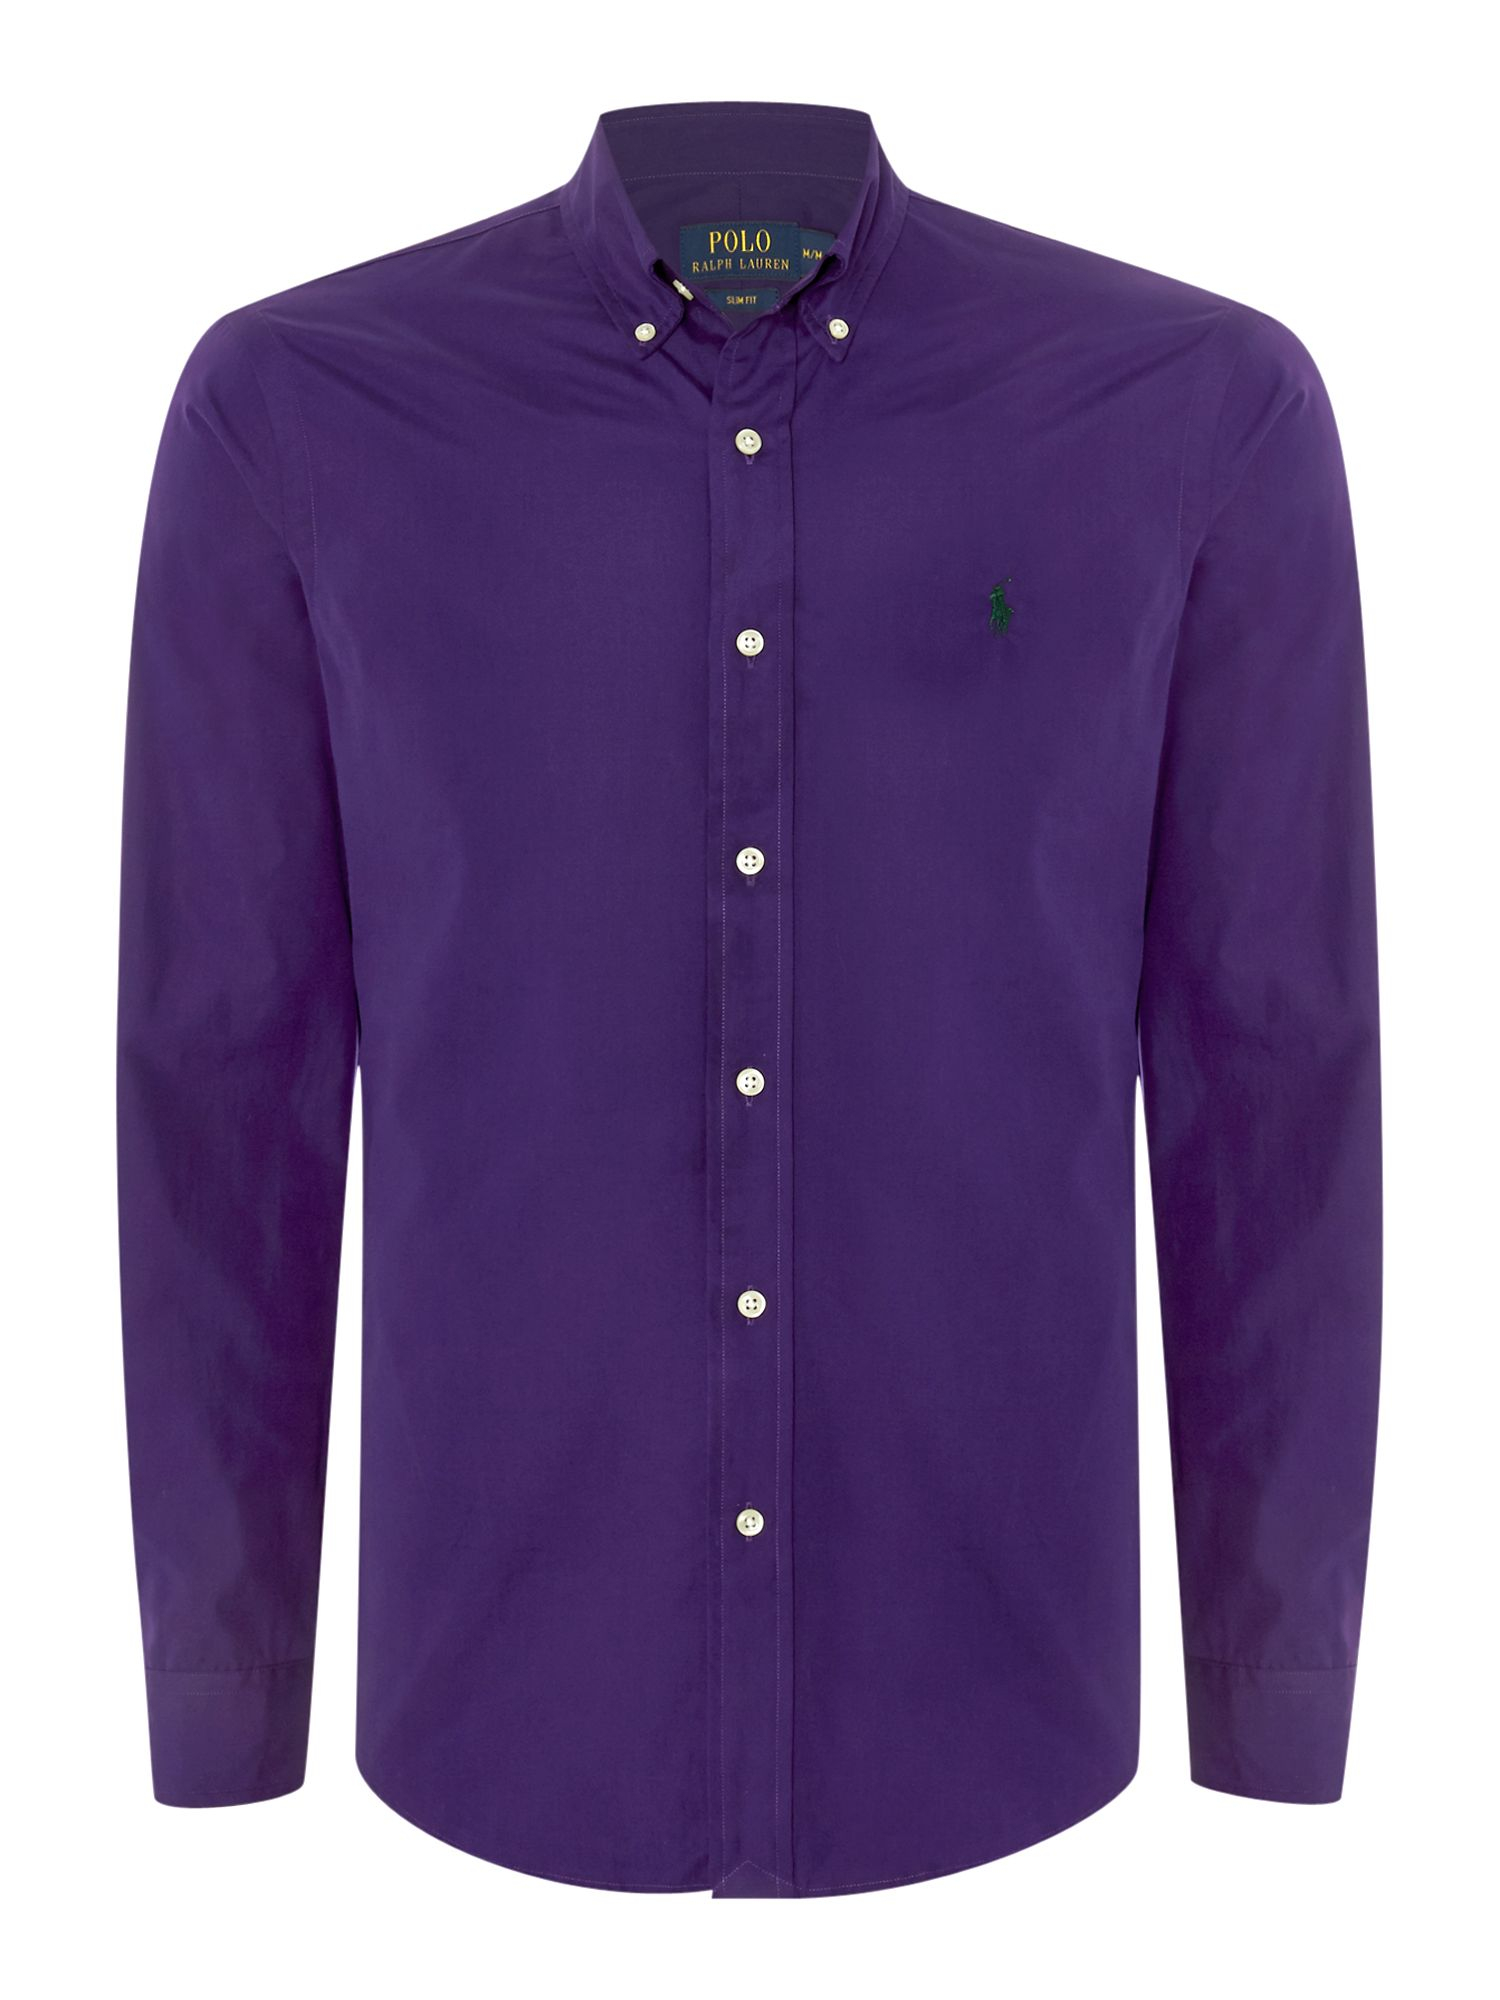 Polo ralph lauren long sleeve slim fit plain shirt in for Long sleeve purple polo shirt